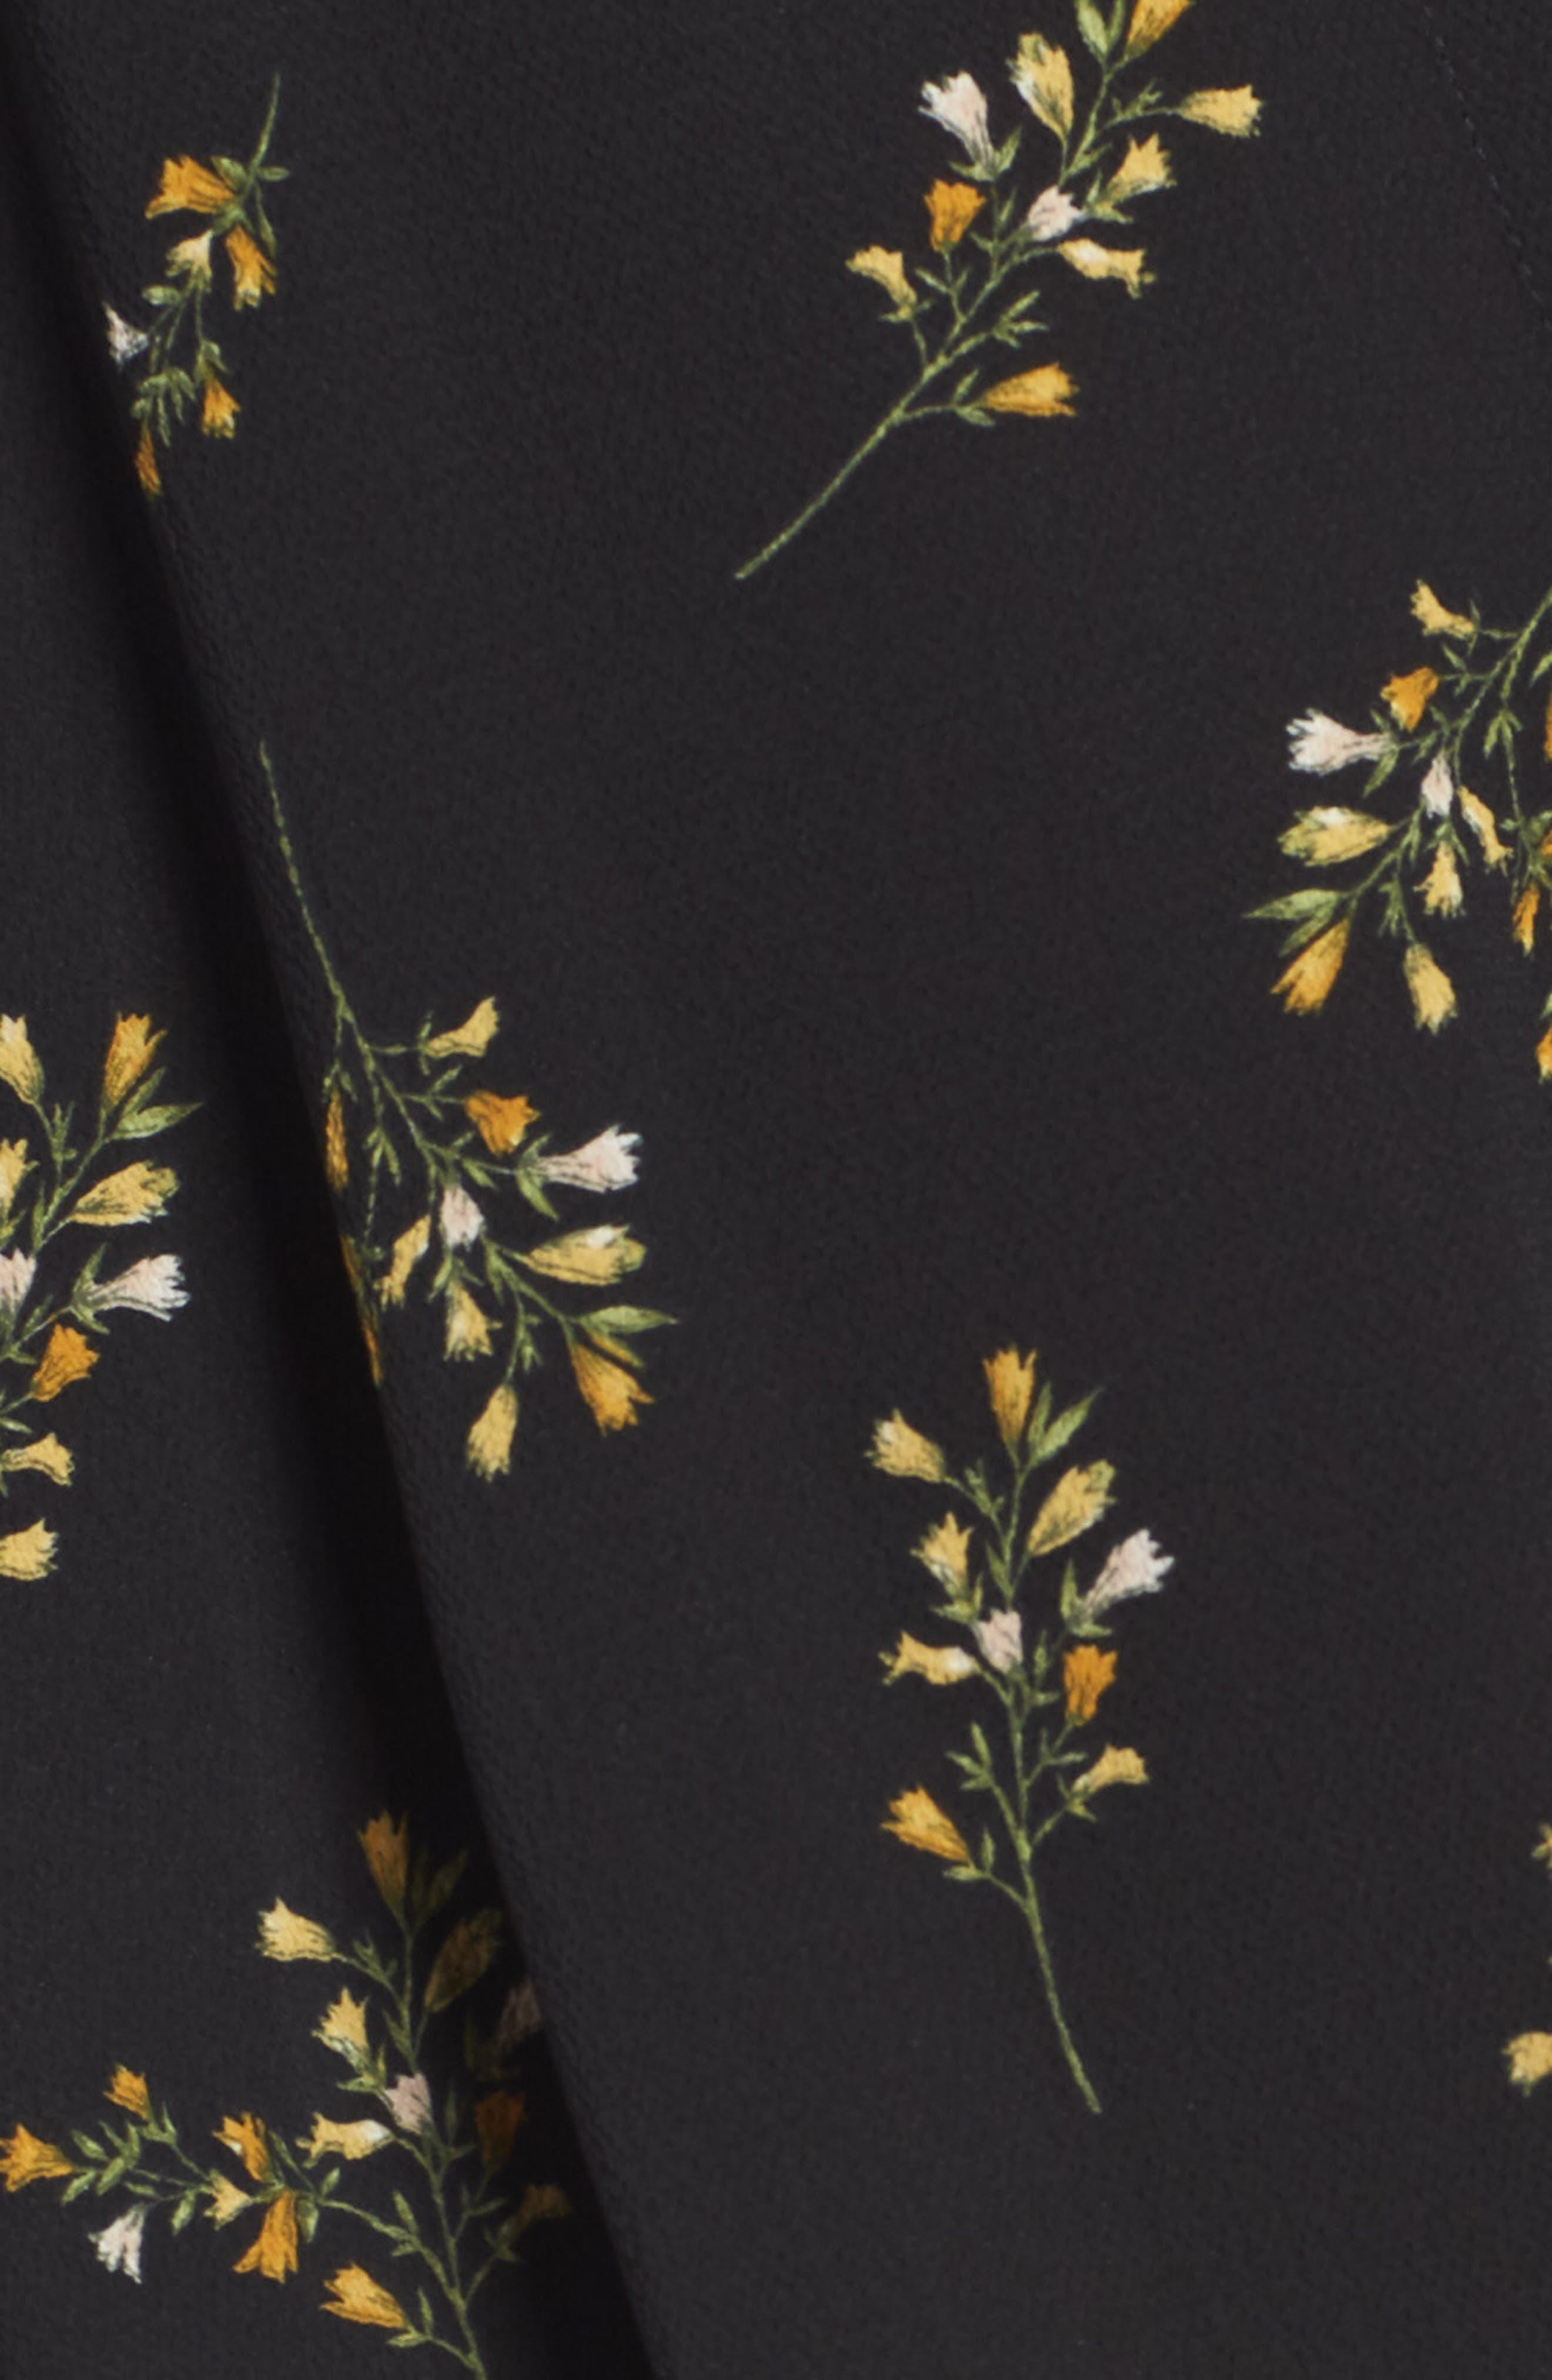 Patterned Drape Front Blouse,                             Alternate thumbnail 5, color,                             BLACK GROUND FLORAL